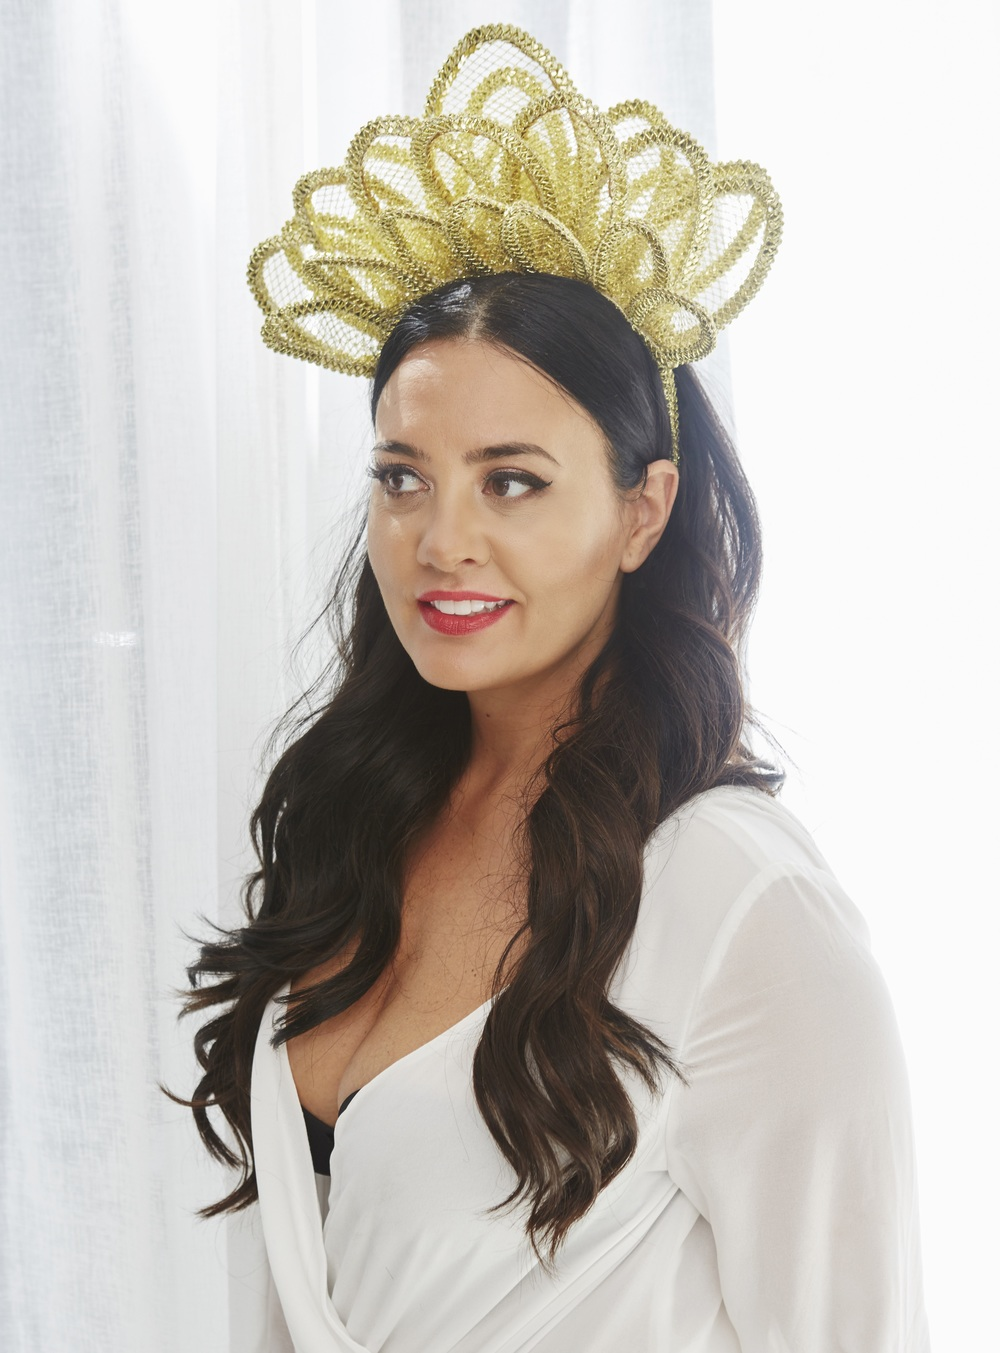 Crown headpiece from IM Designs